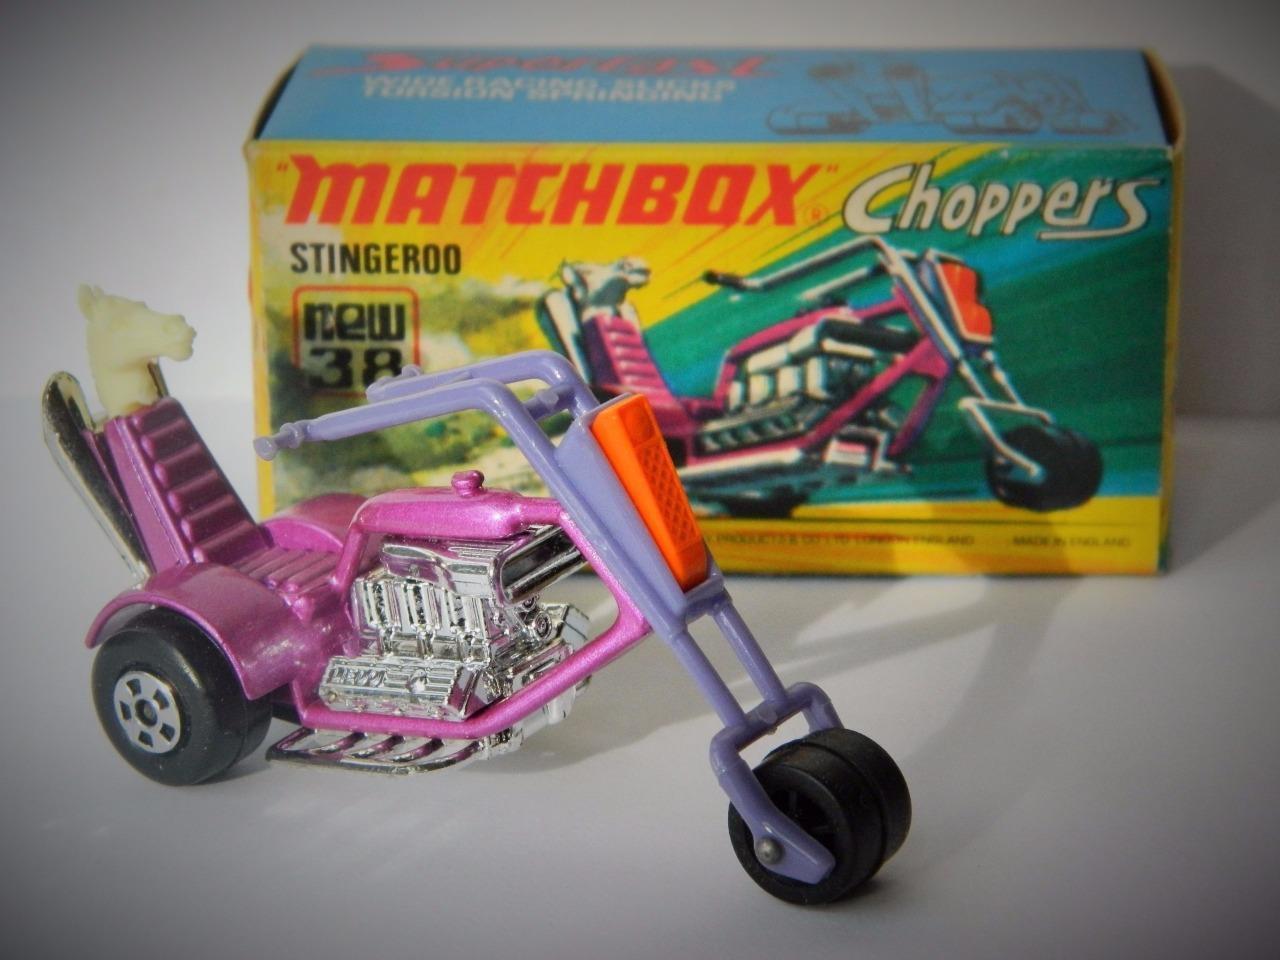 VINTAGE MATCHBOX LESNEY SUPERFAST CHOPPERS No.38 STINGEROO MINT IN 'I' BOX 1973